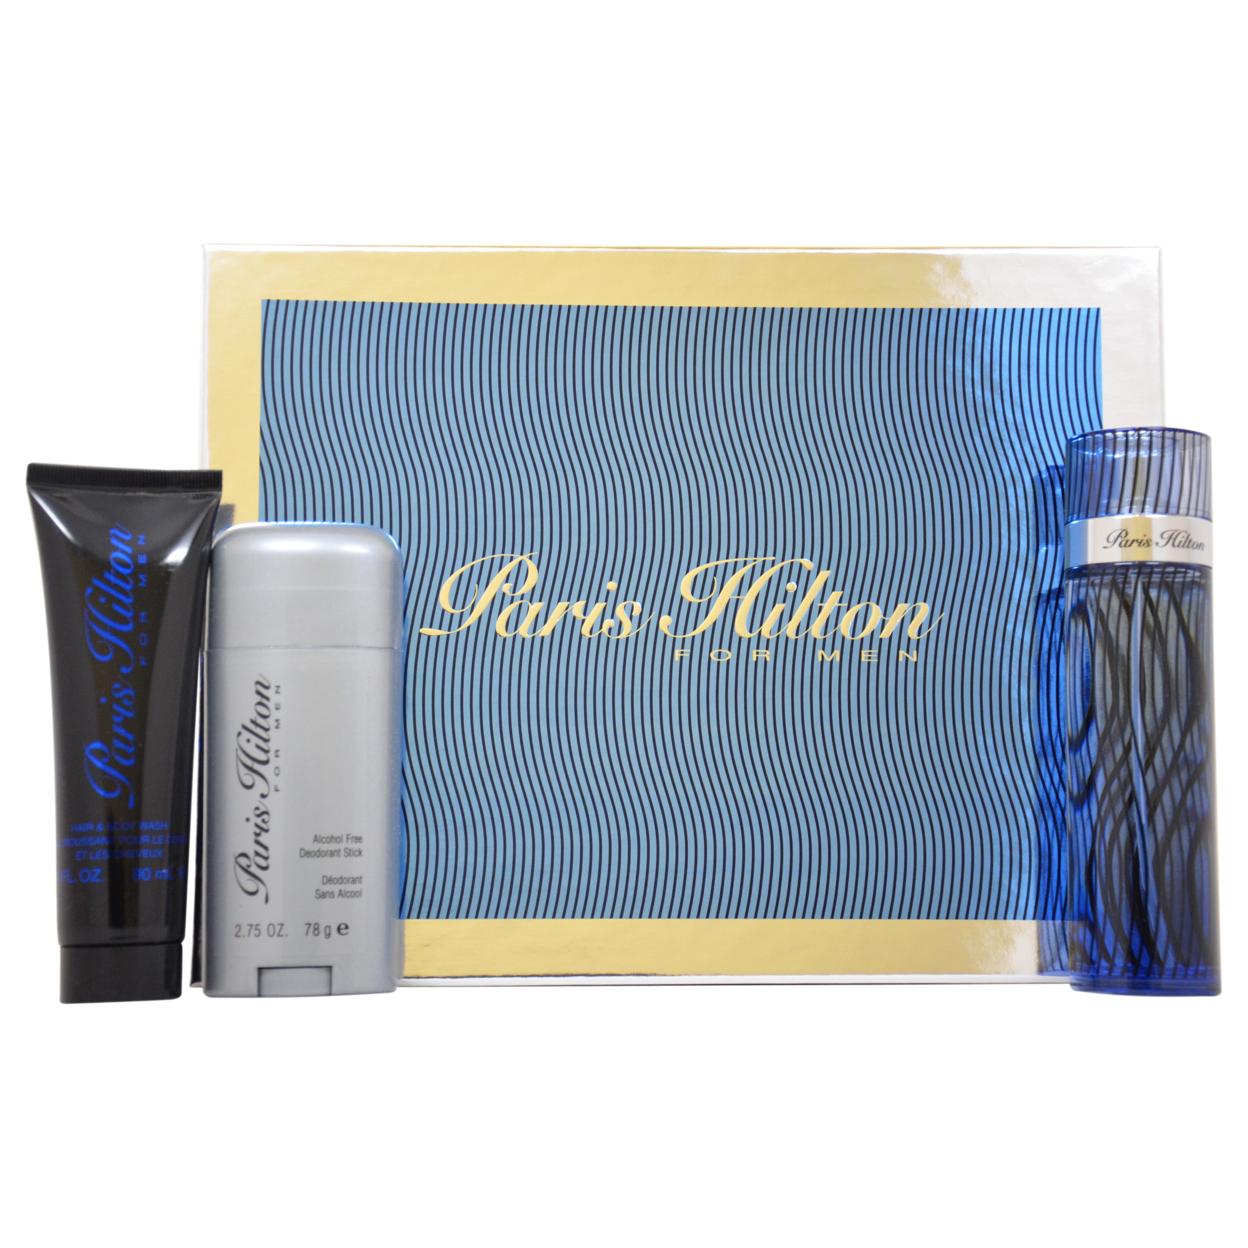 Paris Hilton by Paris Hilton for Men - 3 Pc Gift Set 3.4oz EDT Spray, 3oz Hair & Body Wash, 2.75oz Deodorant Stick 593bc5c62a00e432697a7e2f